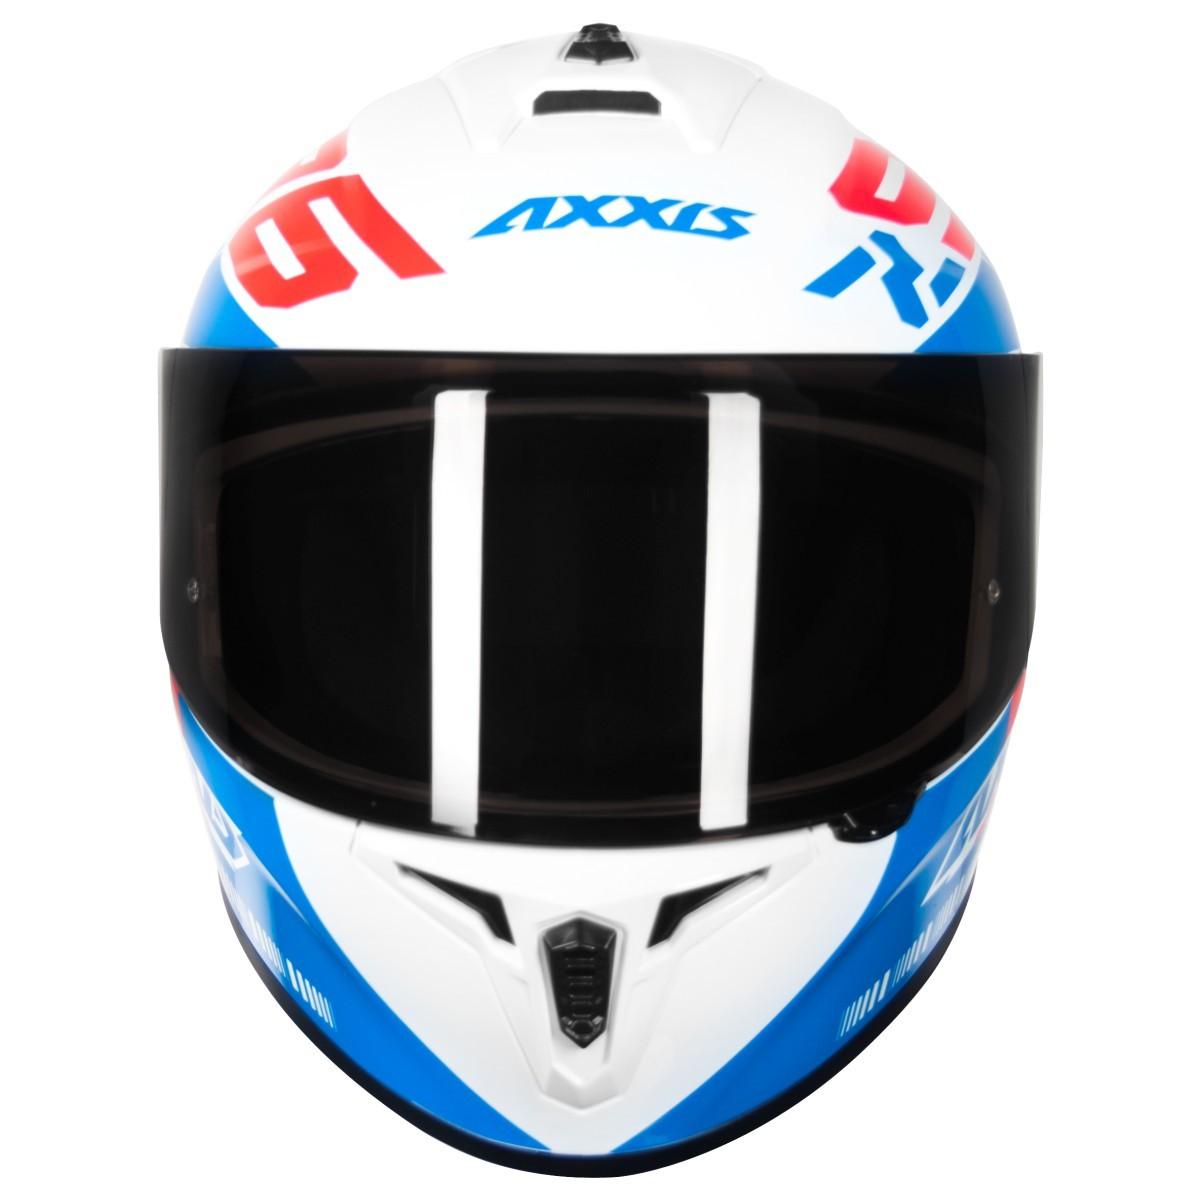 CAPACETE MOTOCICLISTA AXXIS DRAKEN Z96 BRANCO VERMELHO AZUL BRILHANTE